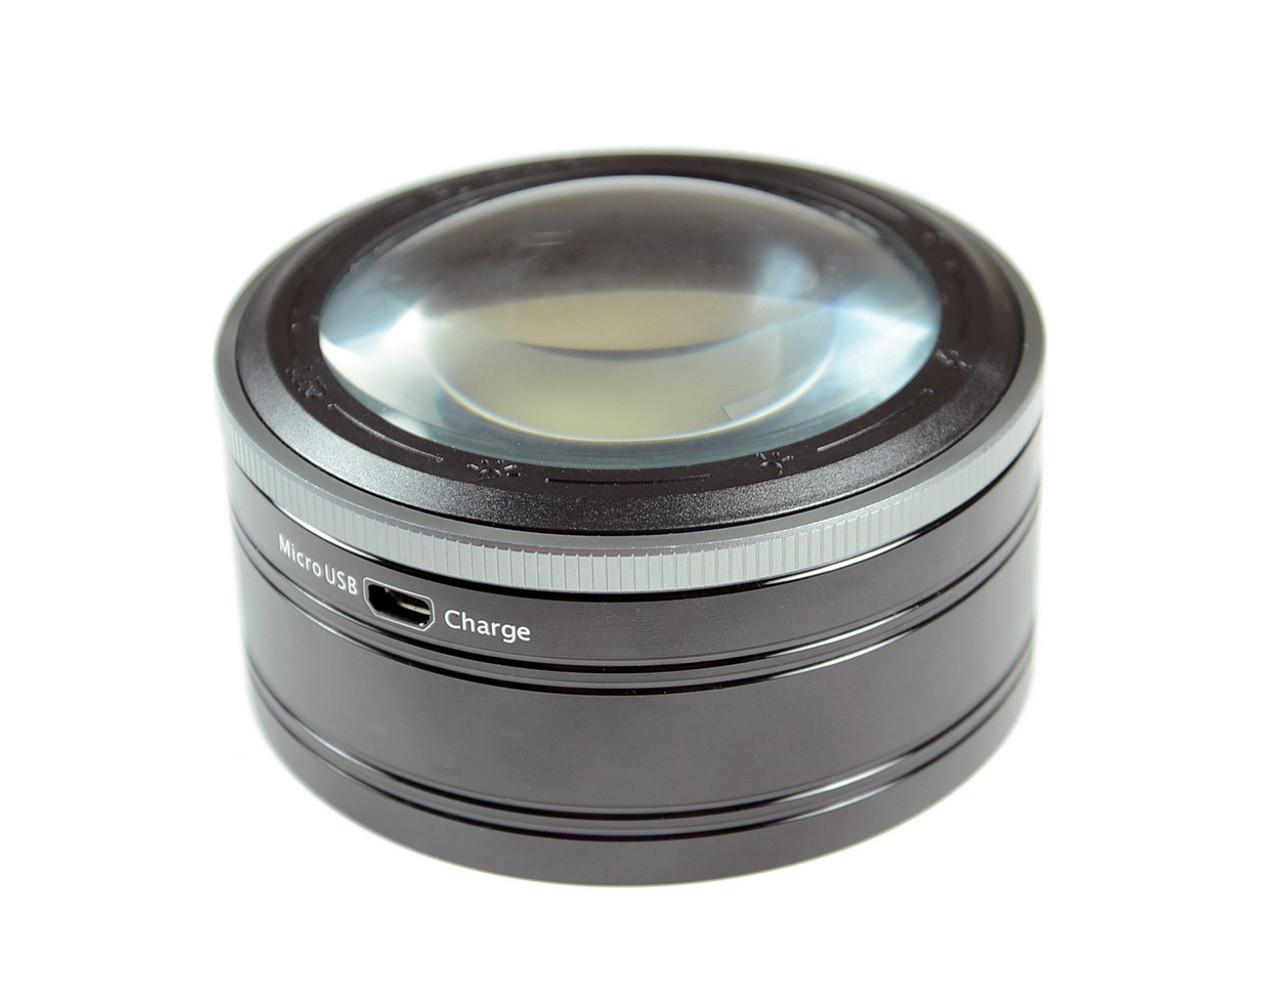 3X 3 Level Illuminated Dome Magnifier